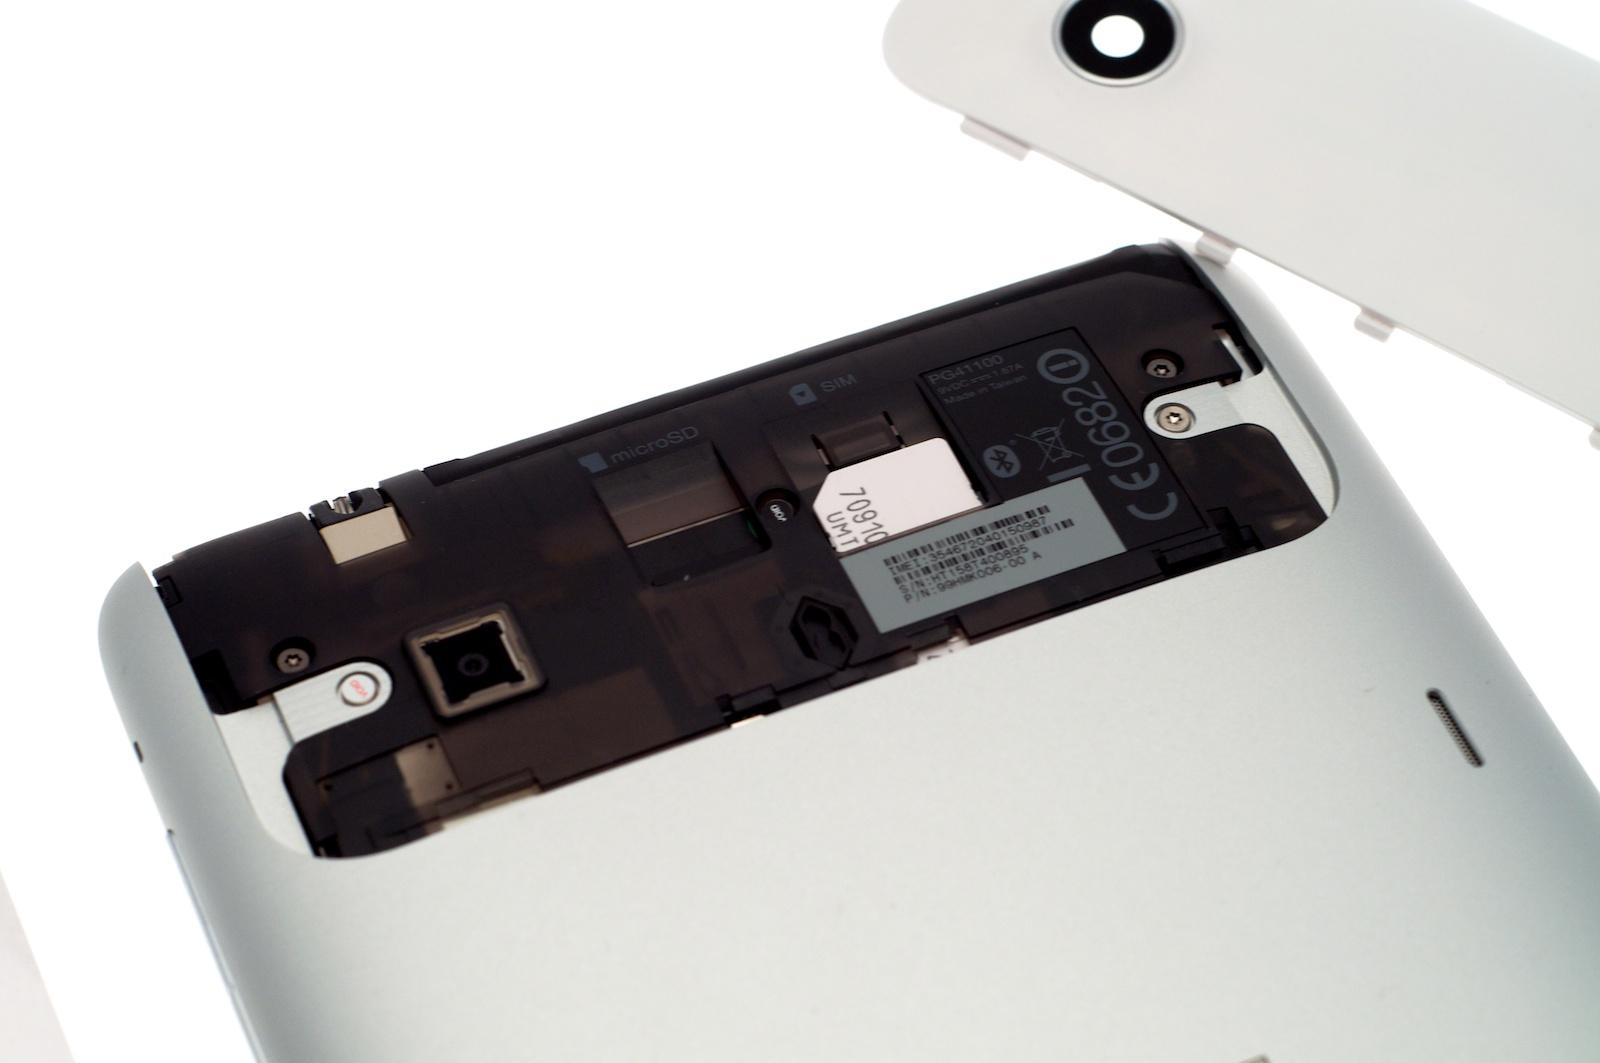 HTC Flyer im Test: Gelungenes Android-Tablet mit eigener Handschrift - Fummelig, aber elegant